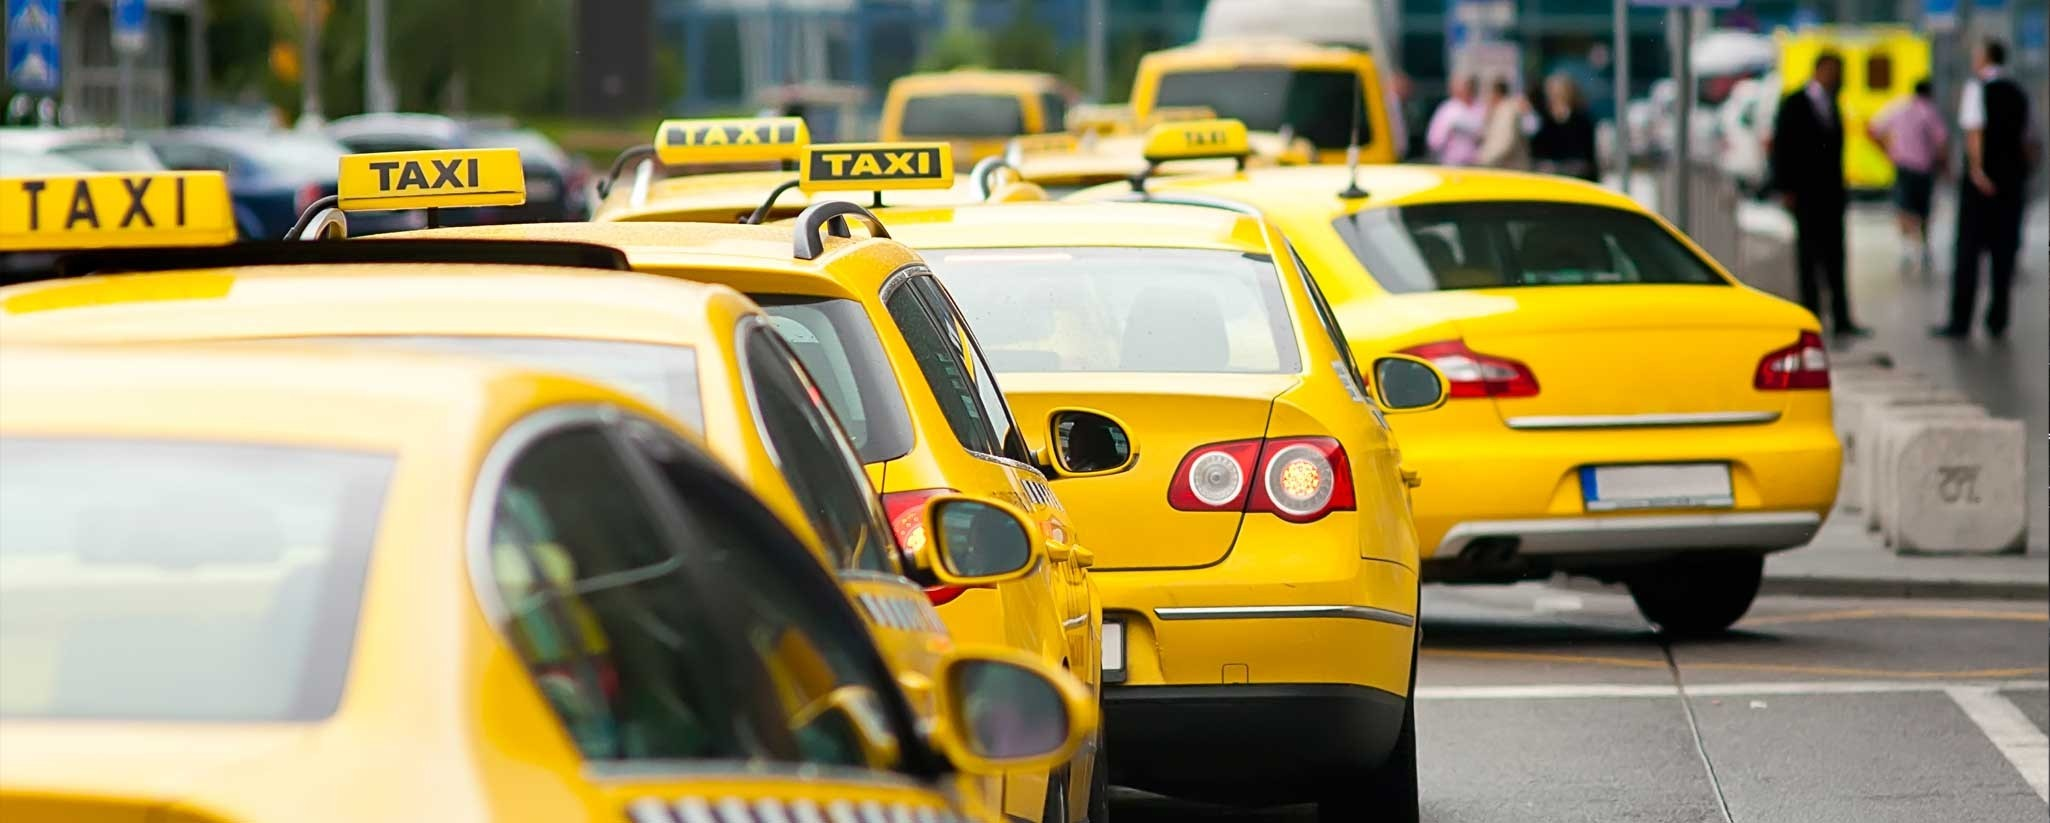 средний пробег такси в городе